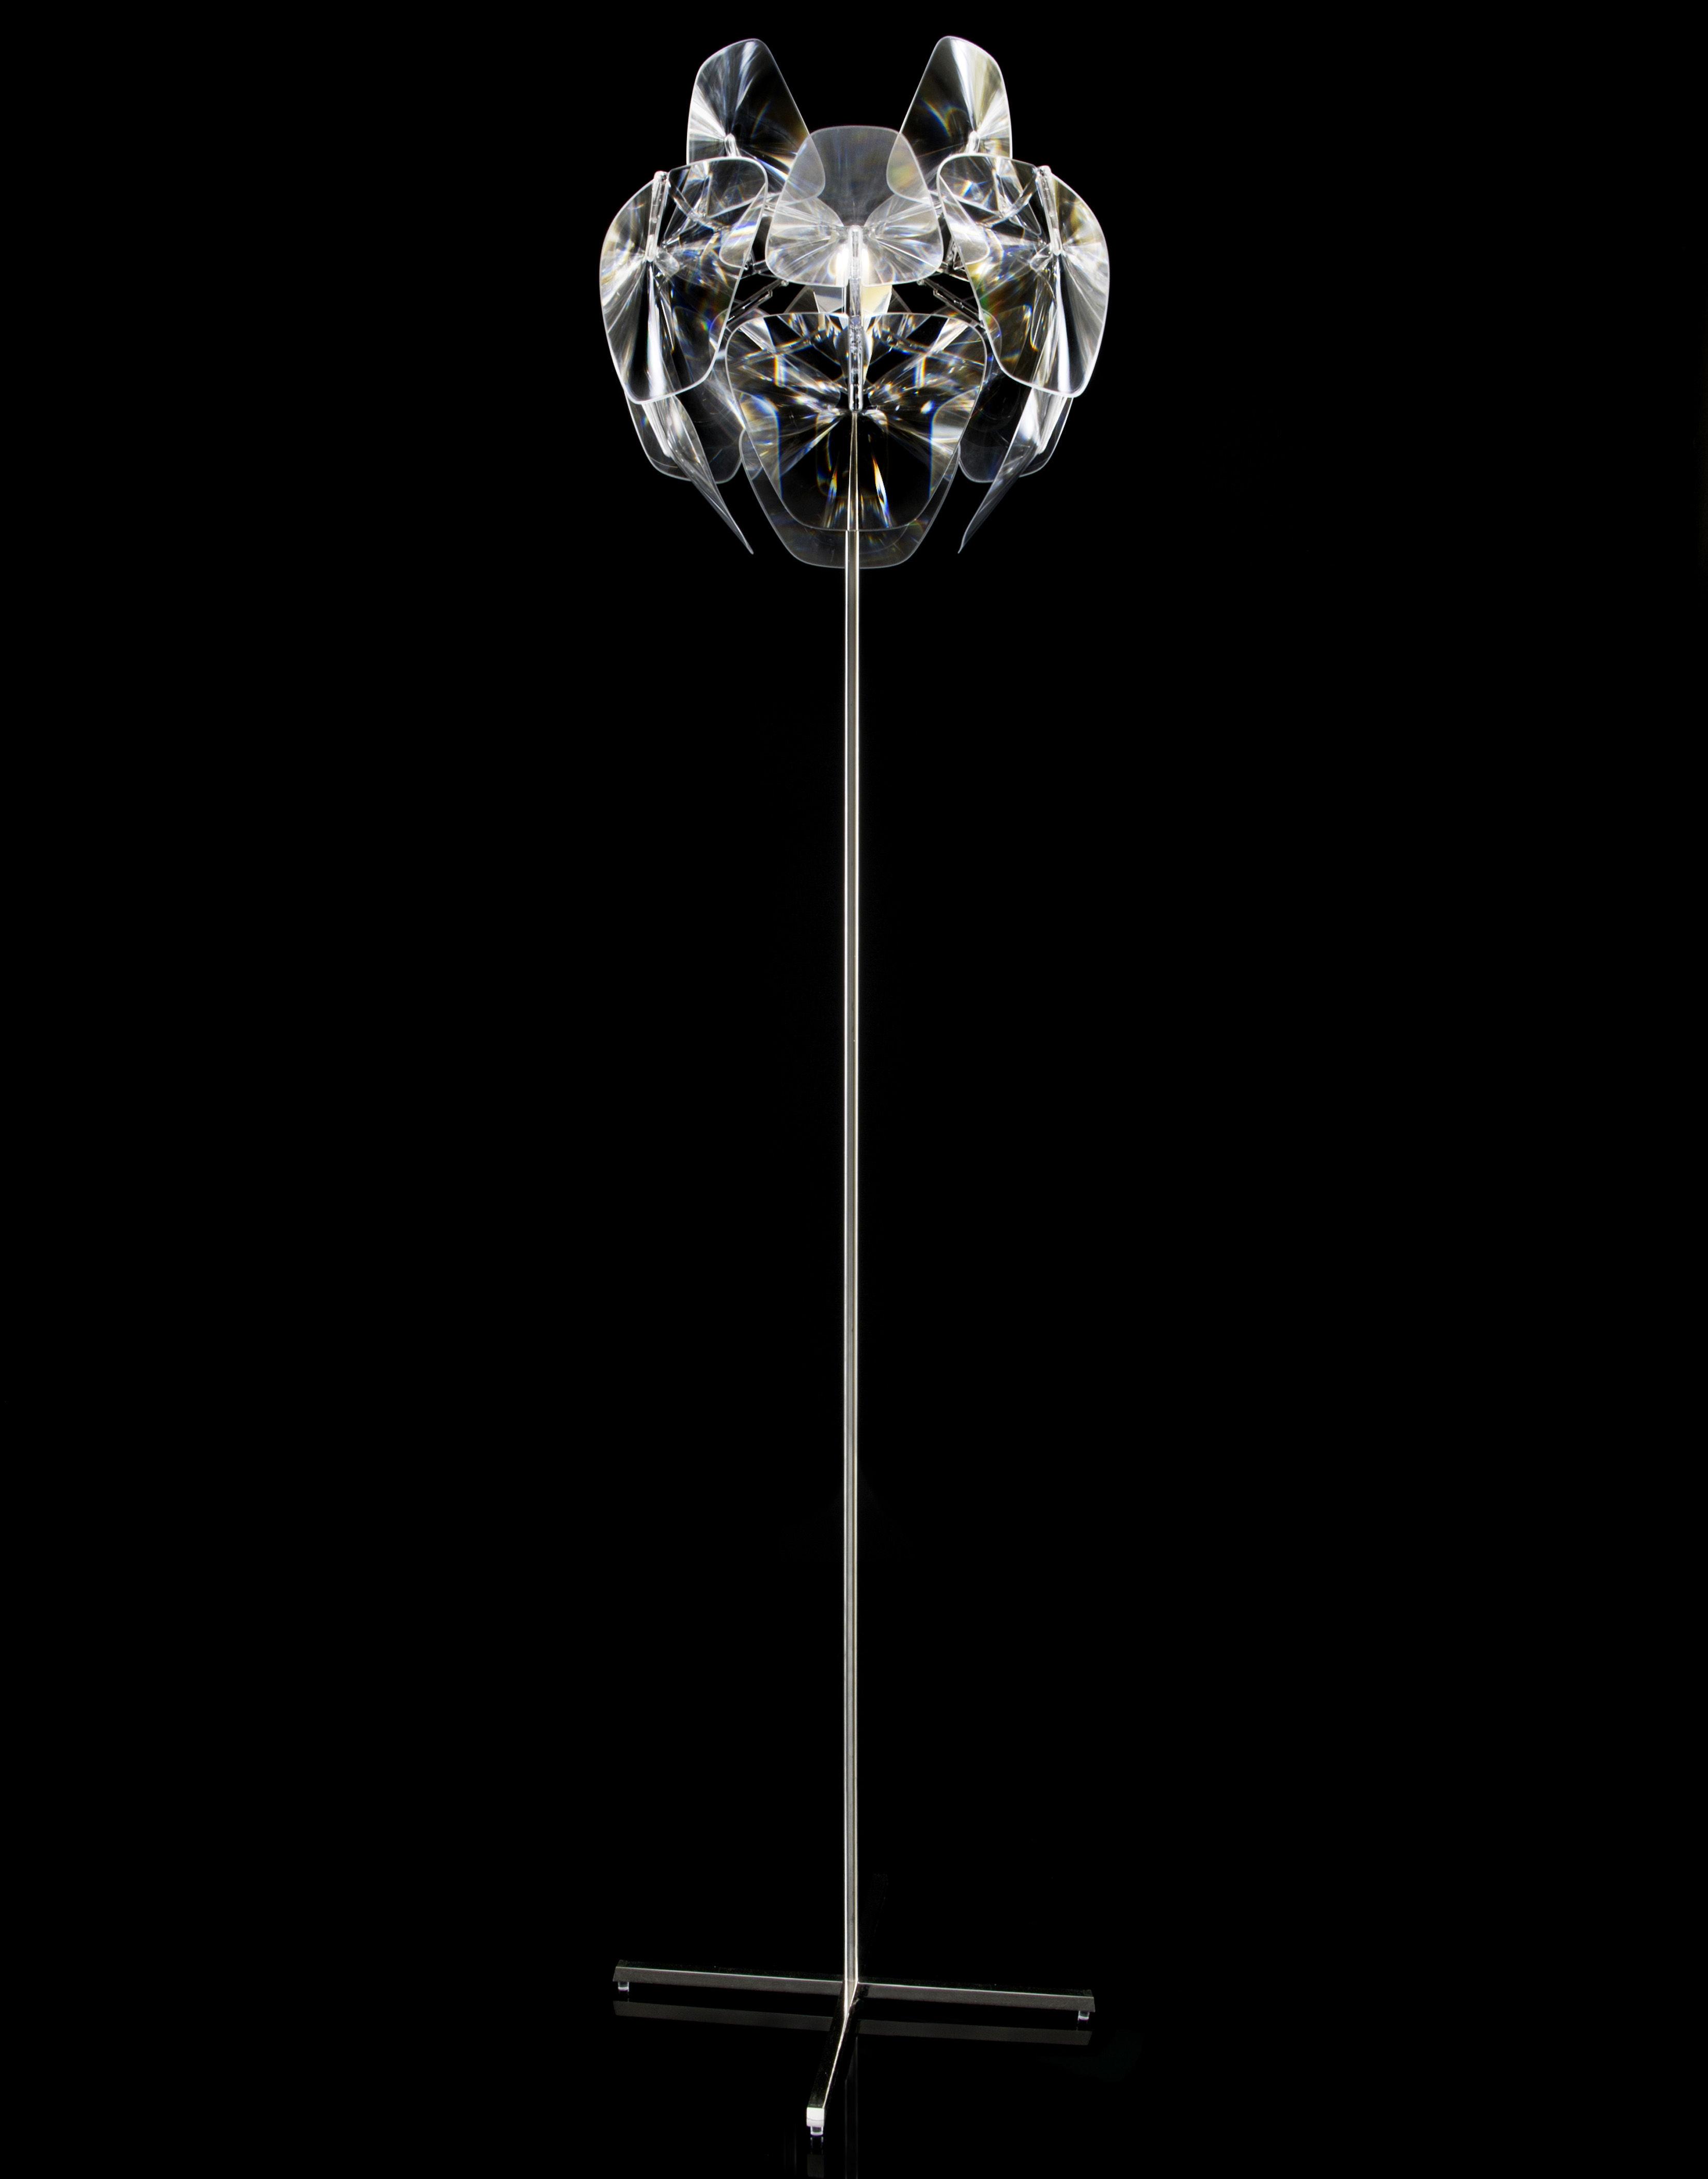 Luminaire - Lampadaires - Lampadaire Hope / pied simple - H 184 cm - Luceplan - Transparent - Lampadaire pied simple - Acier inoxydable poli, Polycarbonate